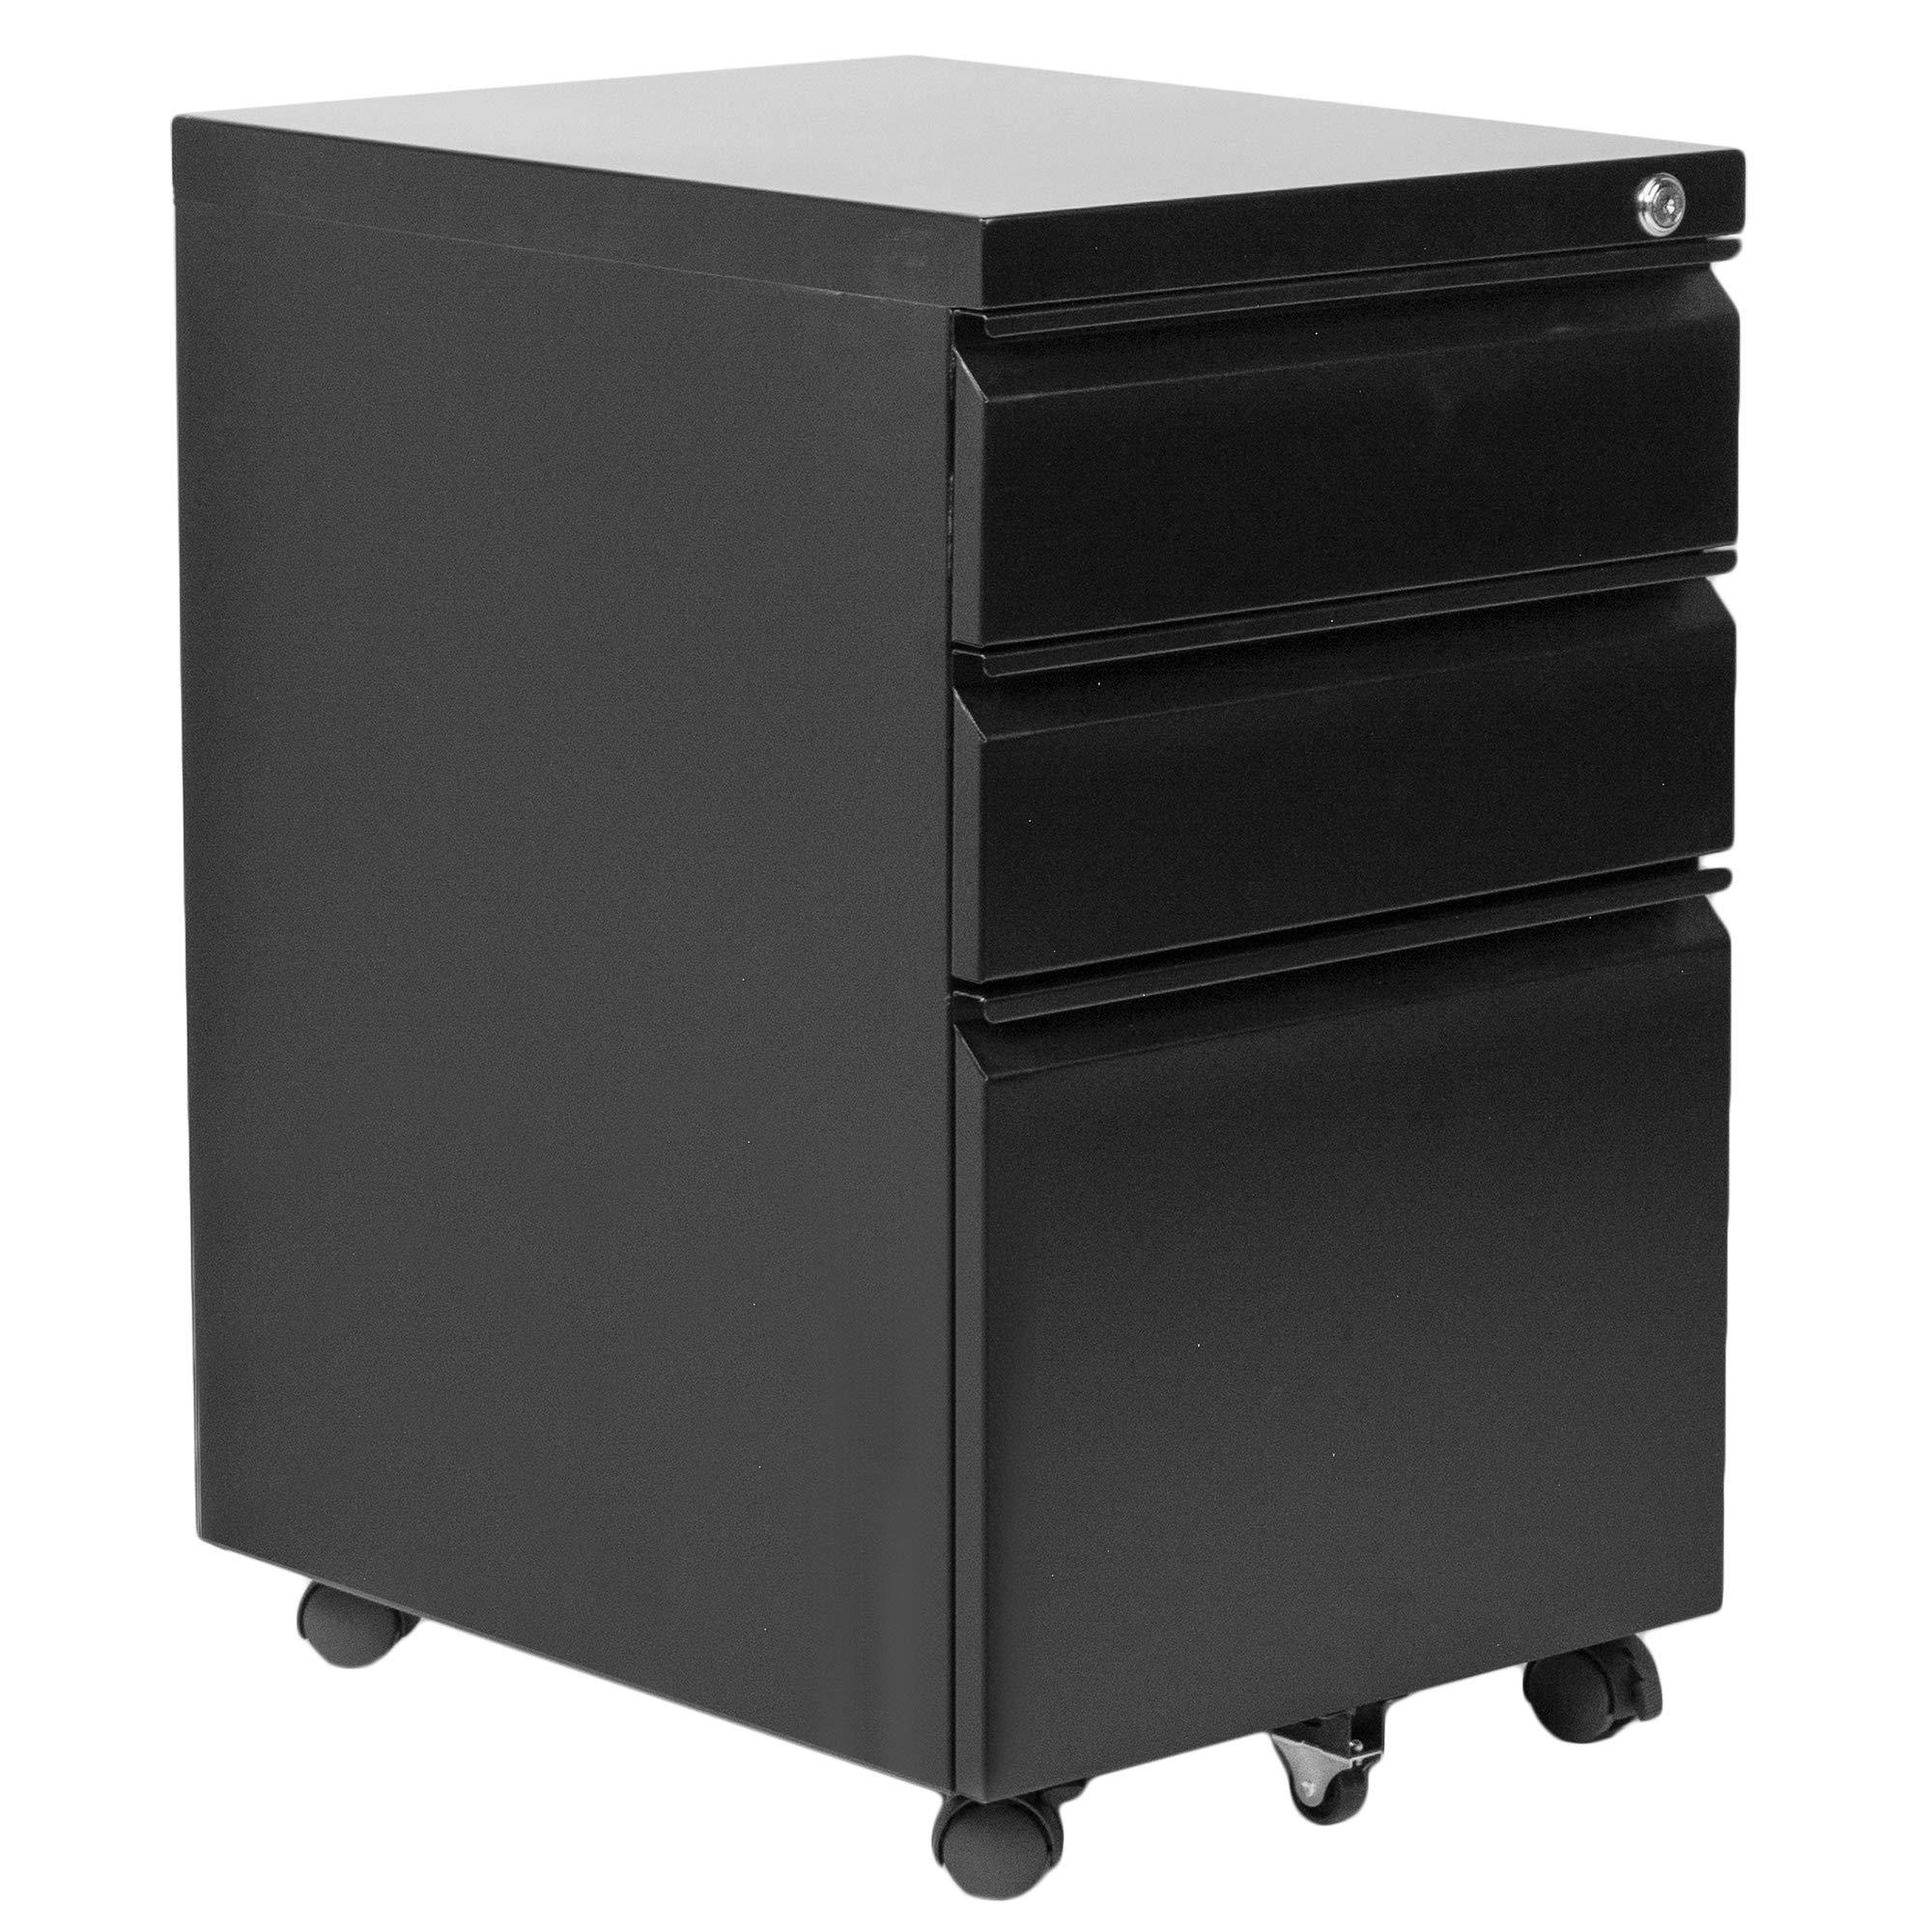 VIVO Black Steel 3 Drawer Mobile Office File Cabinet with Lock | Rolling Pedestal Storage Cabinet on Wheels (FILE-MB01B) by VIVO